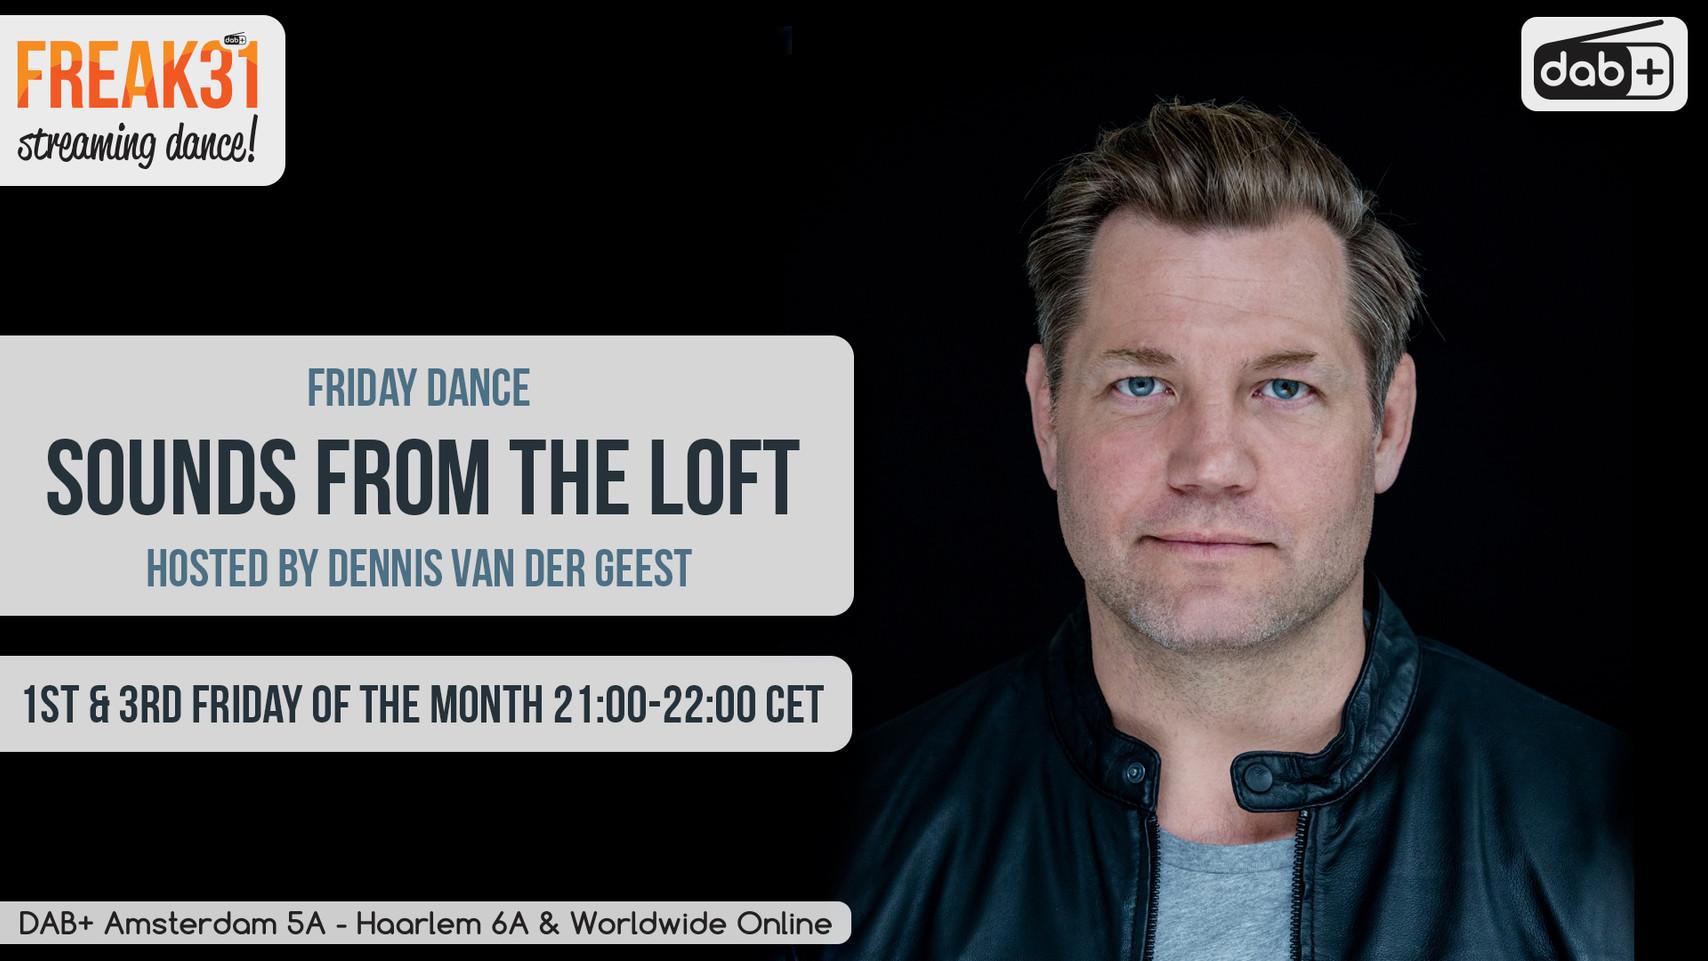 Sounds from the Loft - Dennis van der Geest